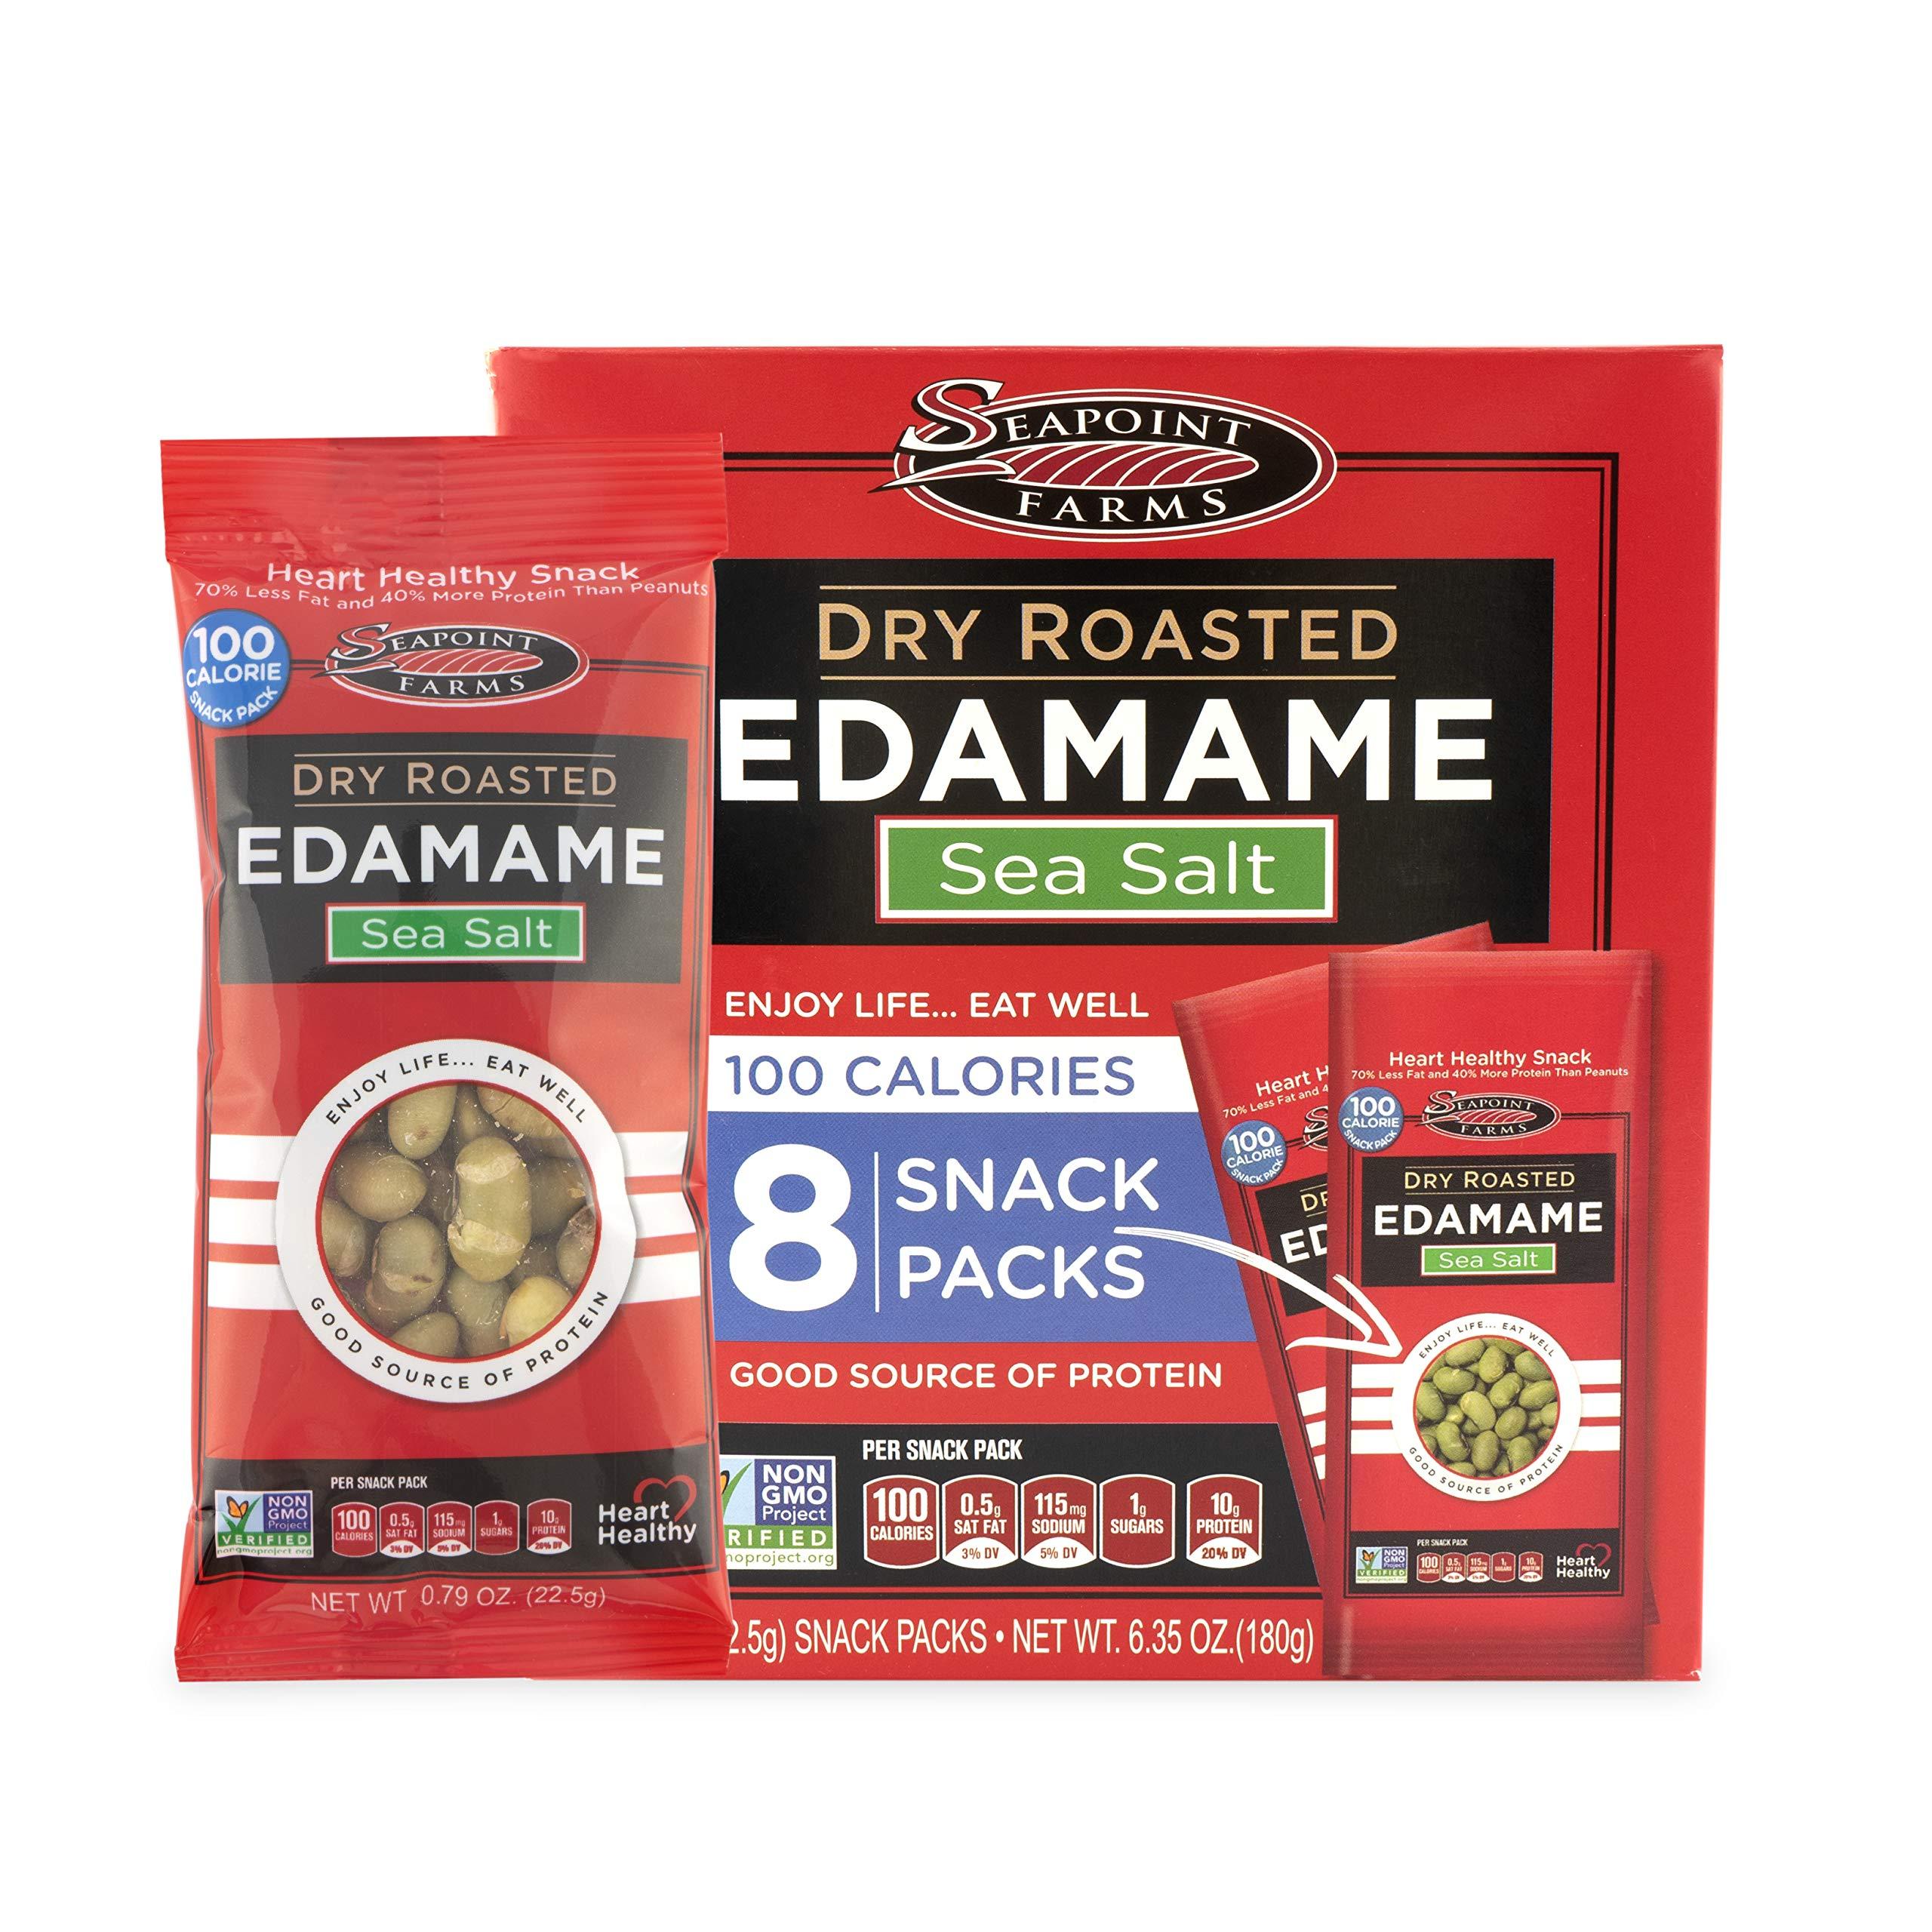 Seapoint Farms Dry Roasted Edamame, Sea Salt, 6.35 oz (Pack of 12)